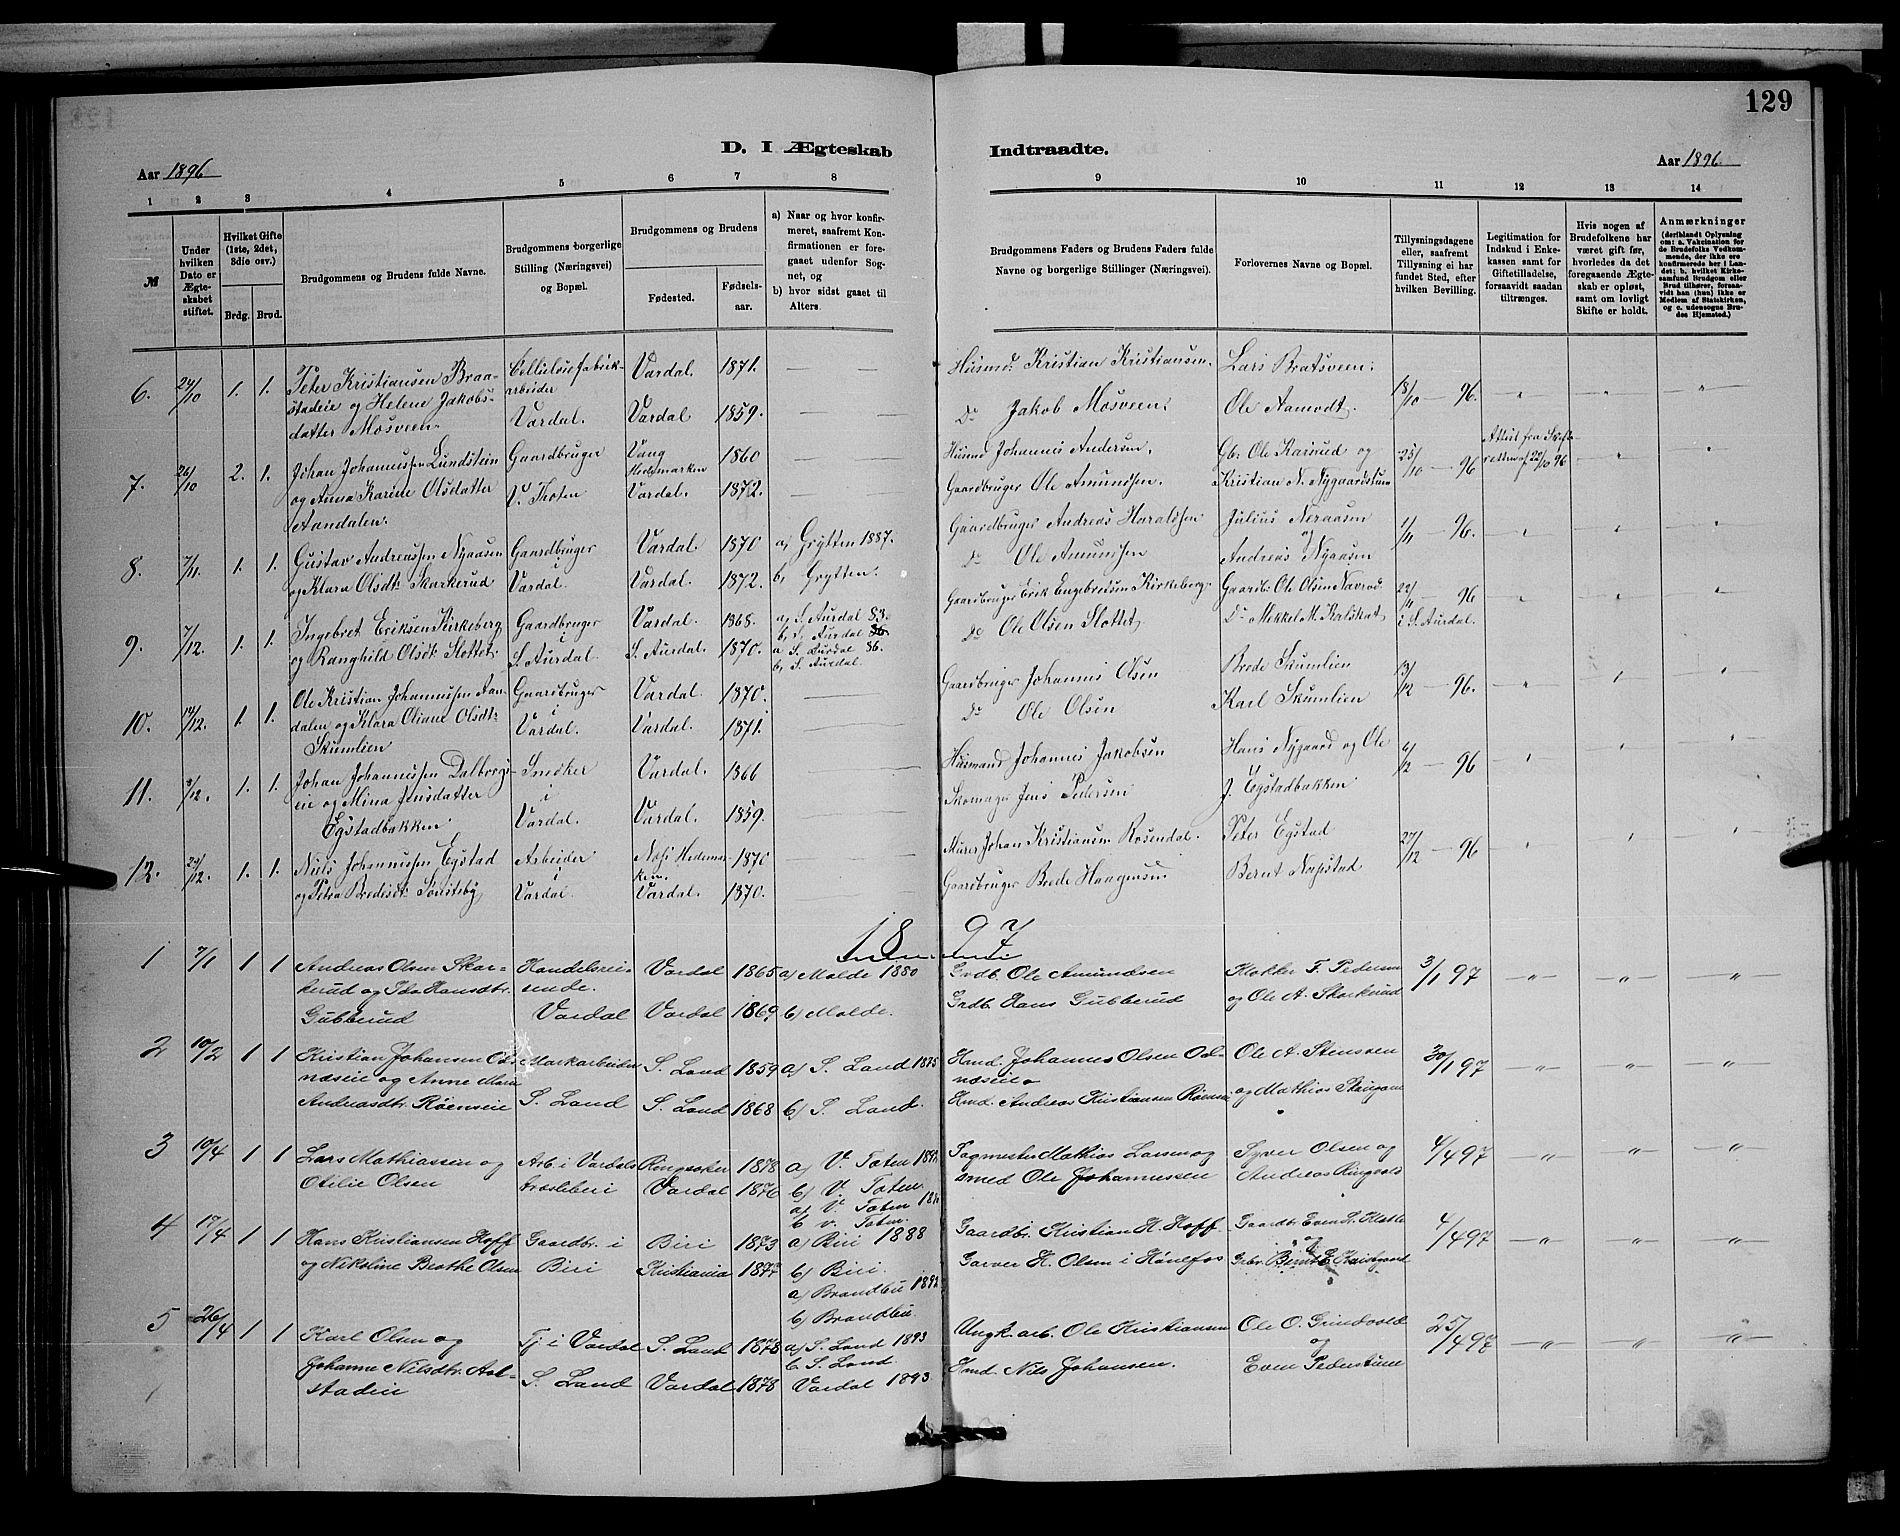 SAH, Vardal prestekontor, H/Ha/Hab/L0008: Klokkerbok nr. 8, 1881-1898, s. 129